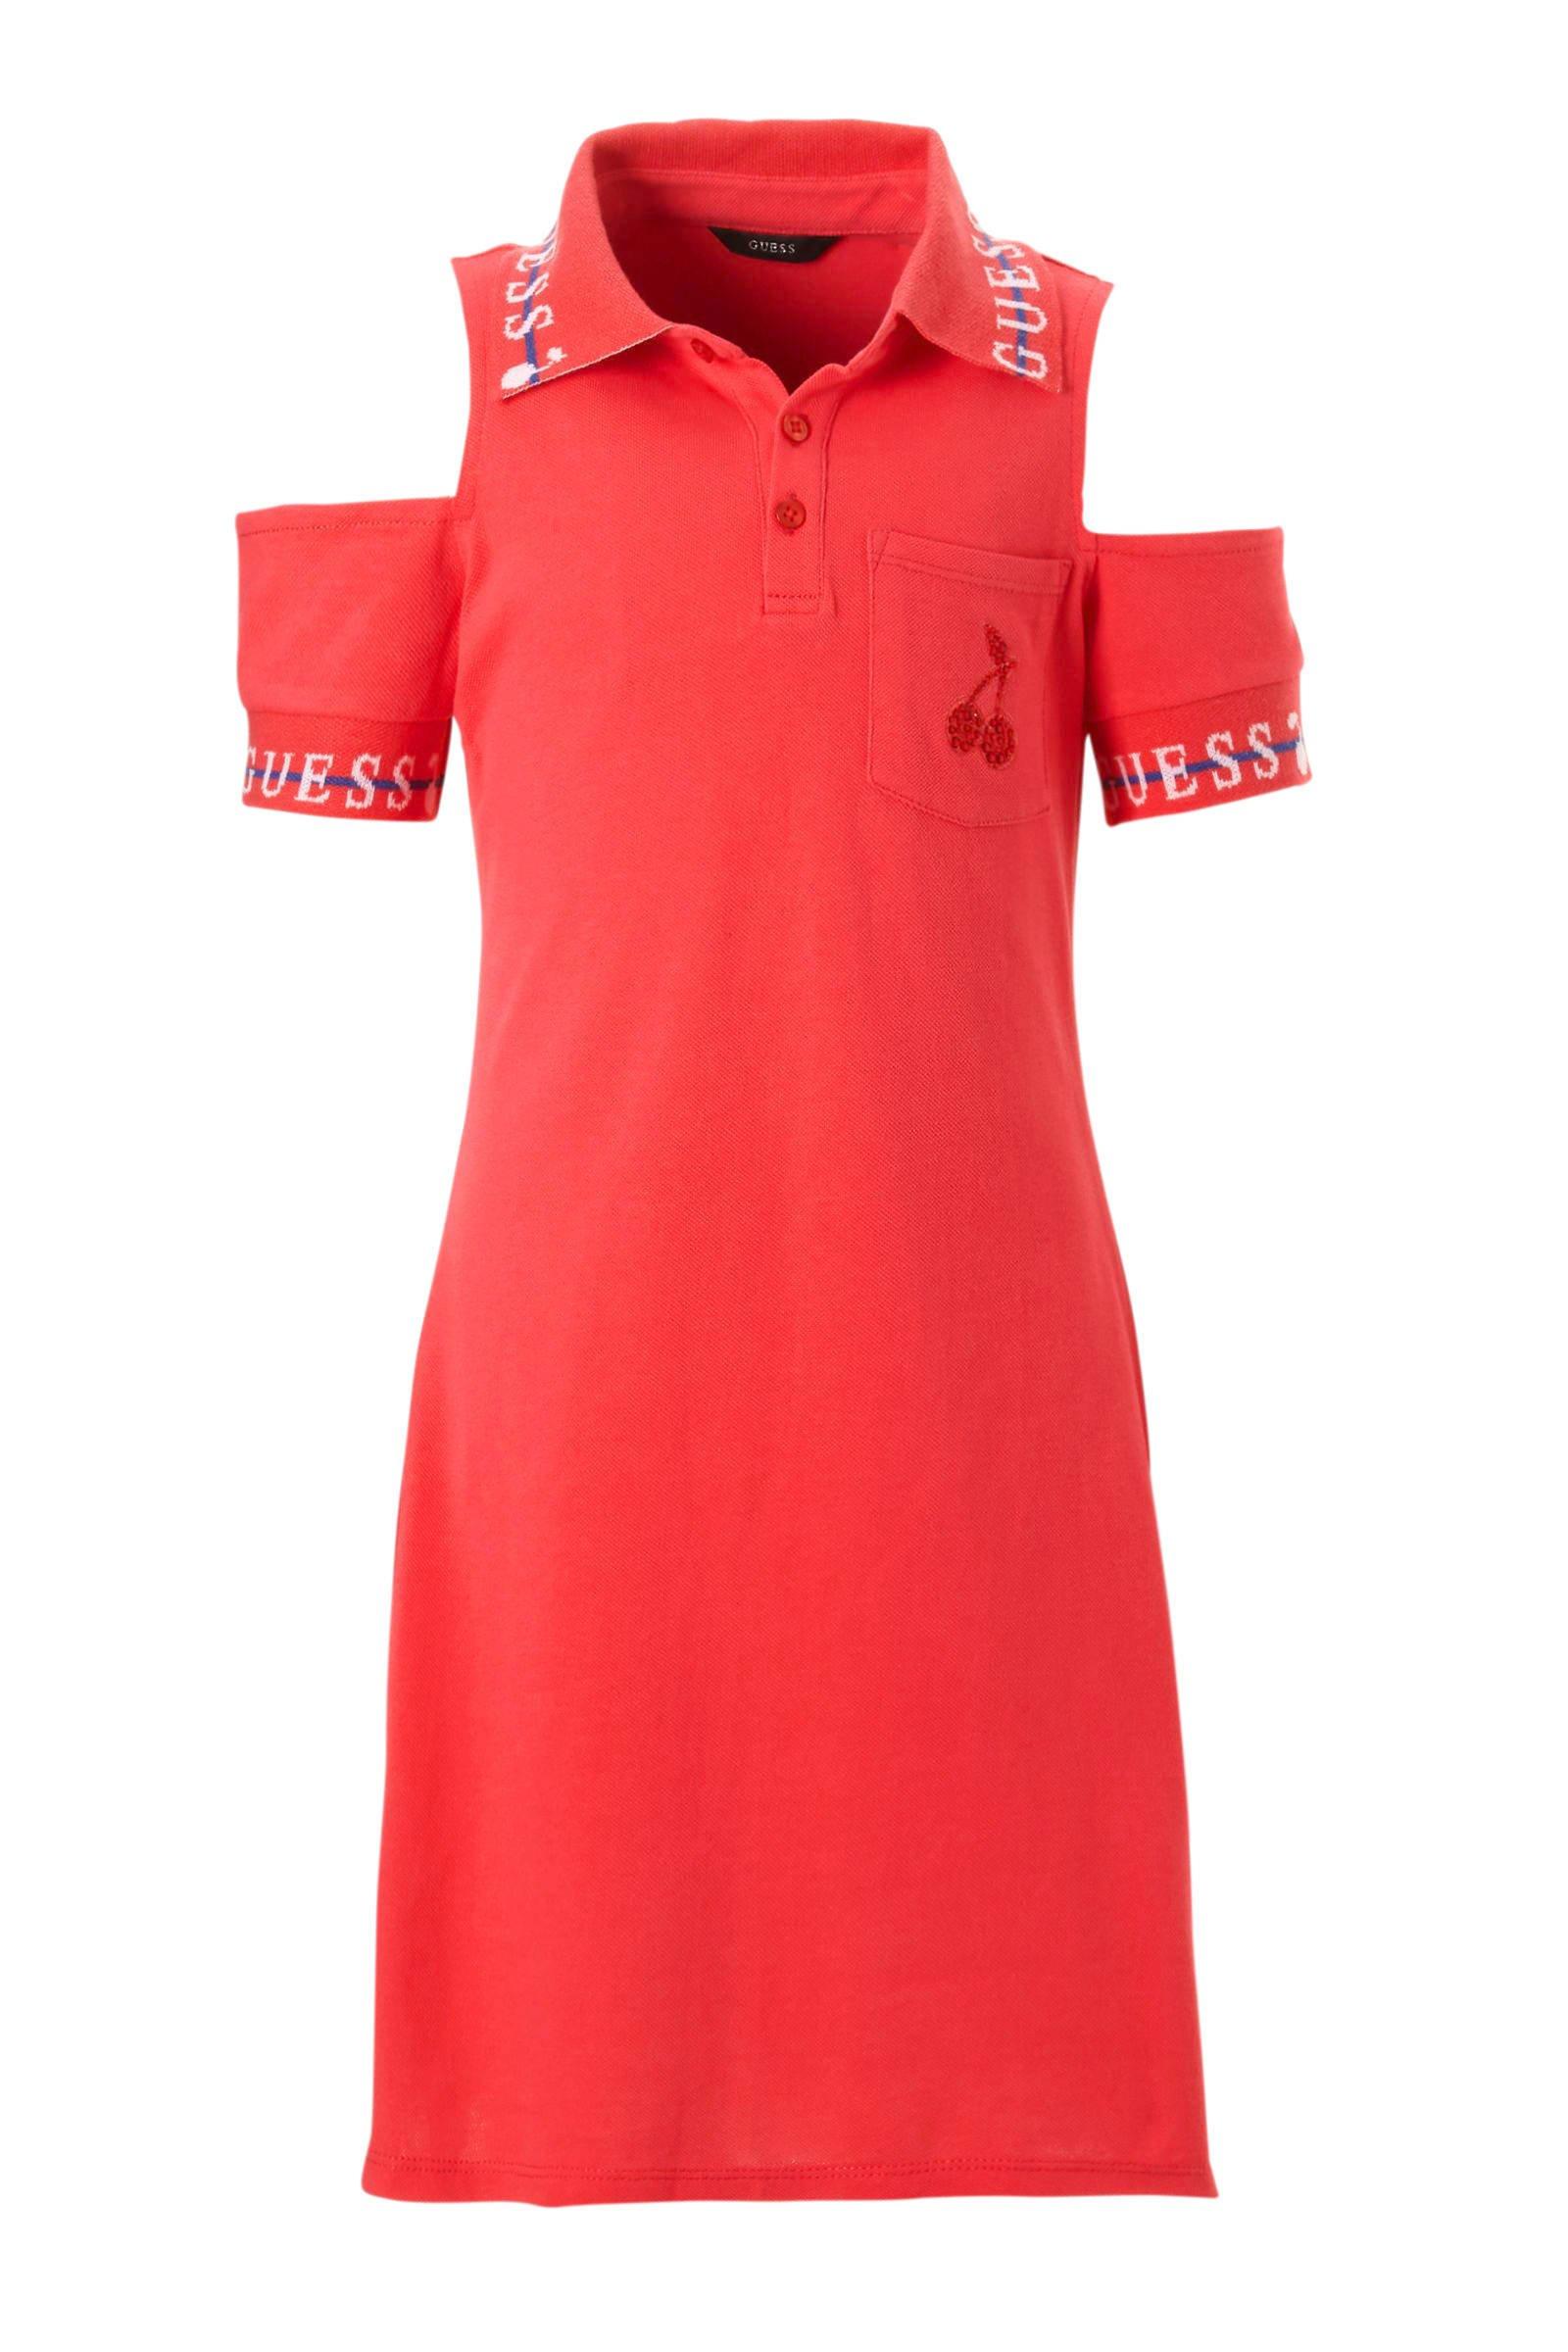 beb53a8d817 guess-open-shoulder-jurk-met-tekst-rood-rood-7613402868333.jpg